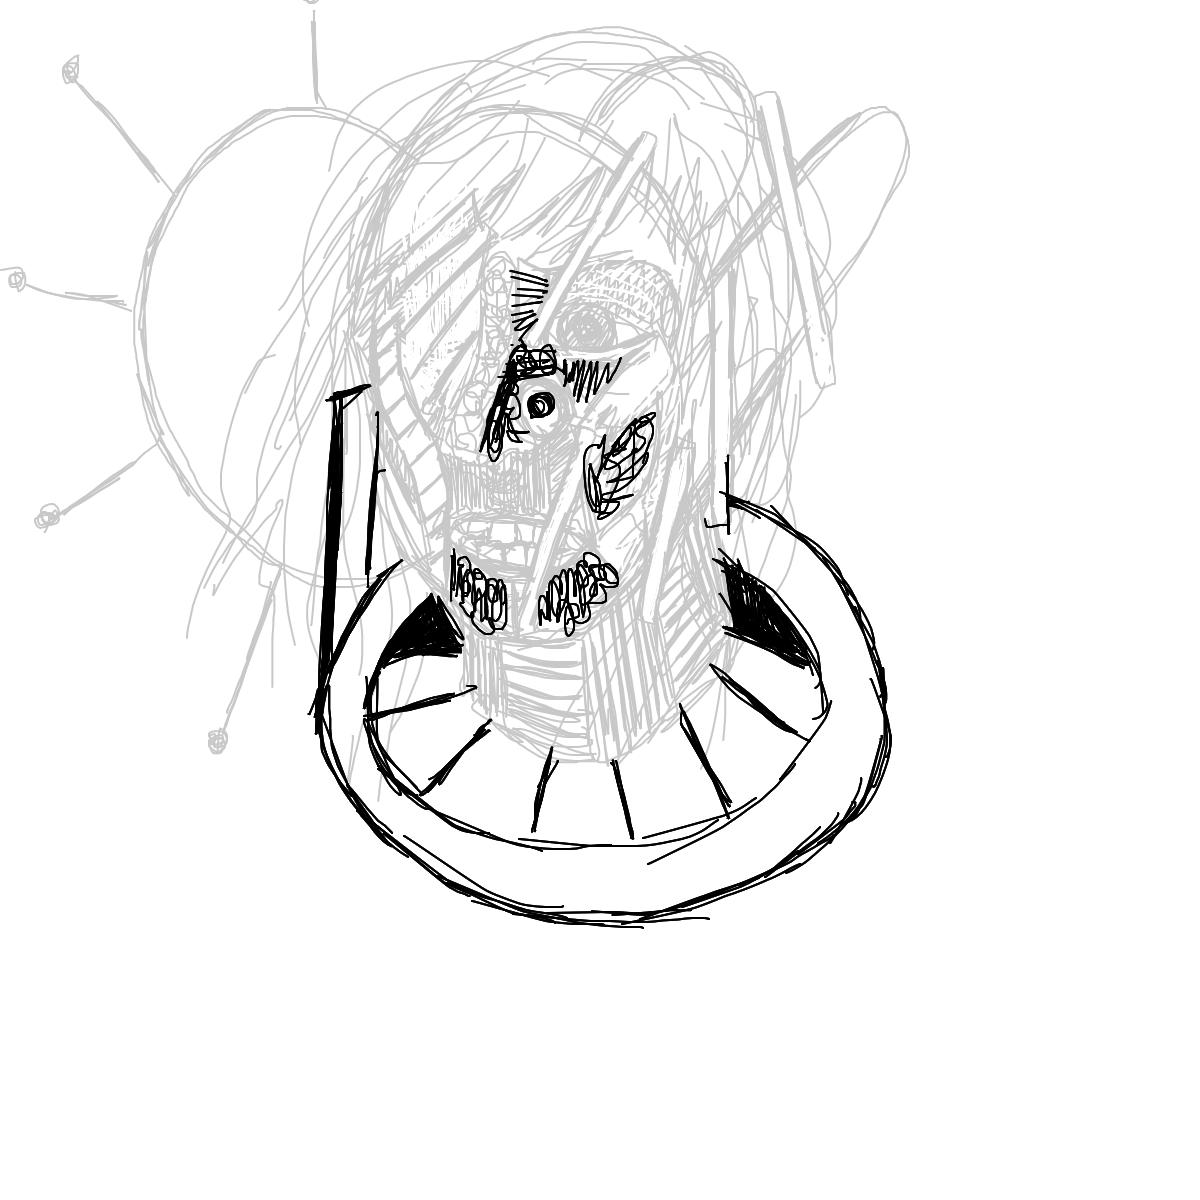 BAAAM drawing#5708 lat:51.5427207946777340lng: -0.1421047896146774